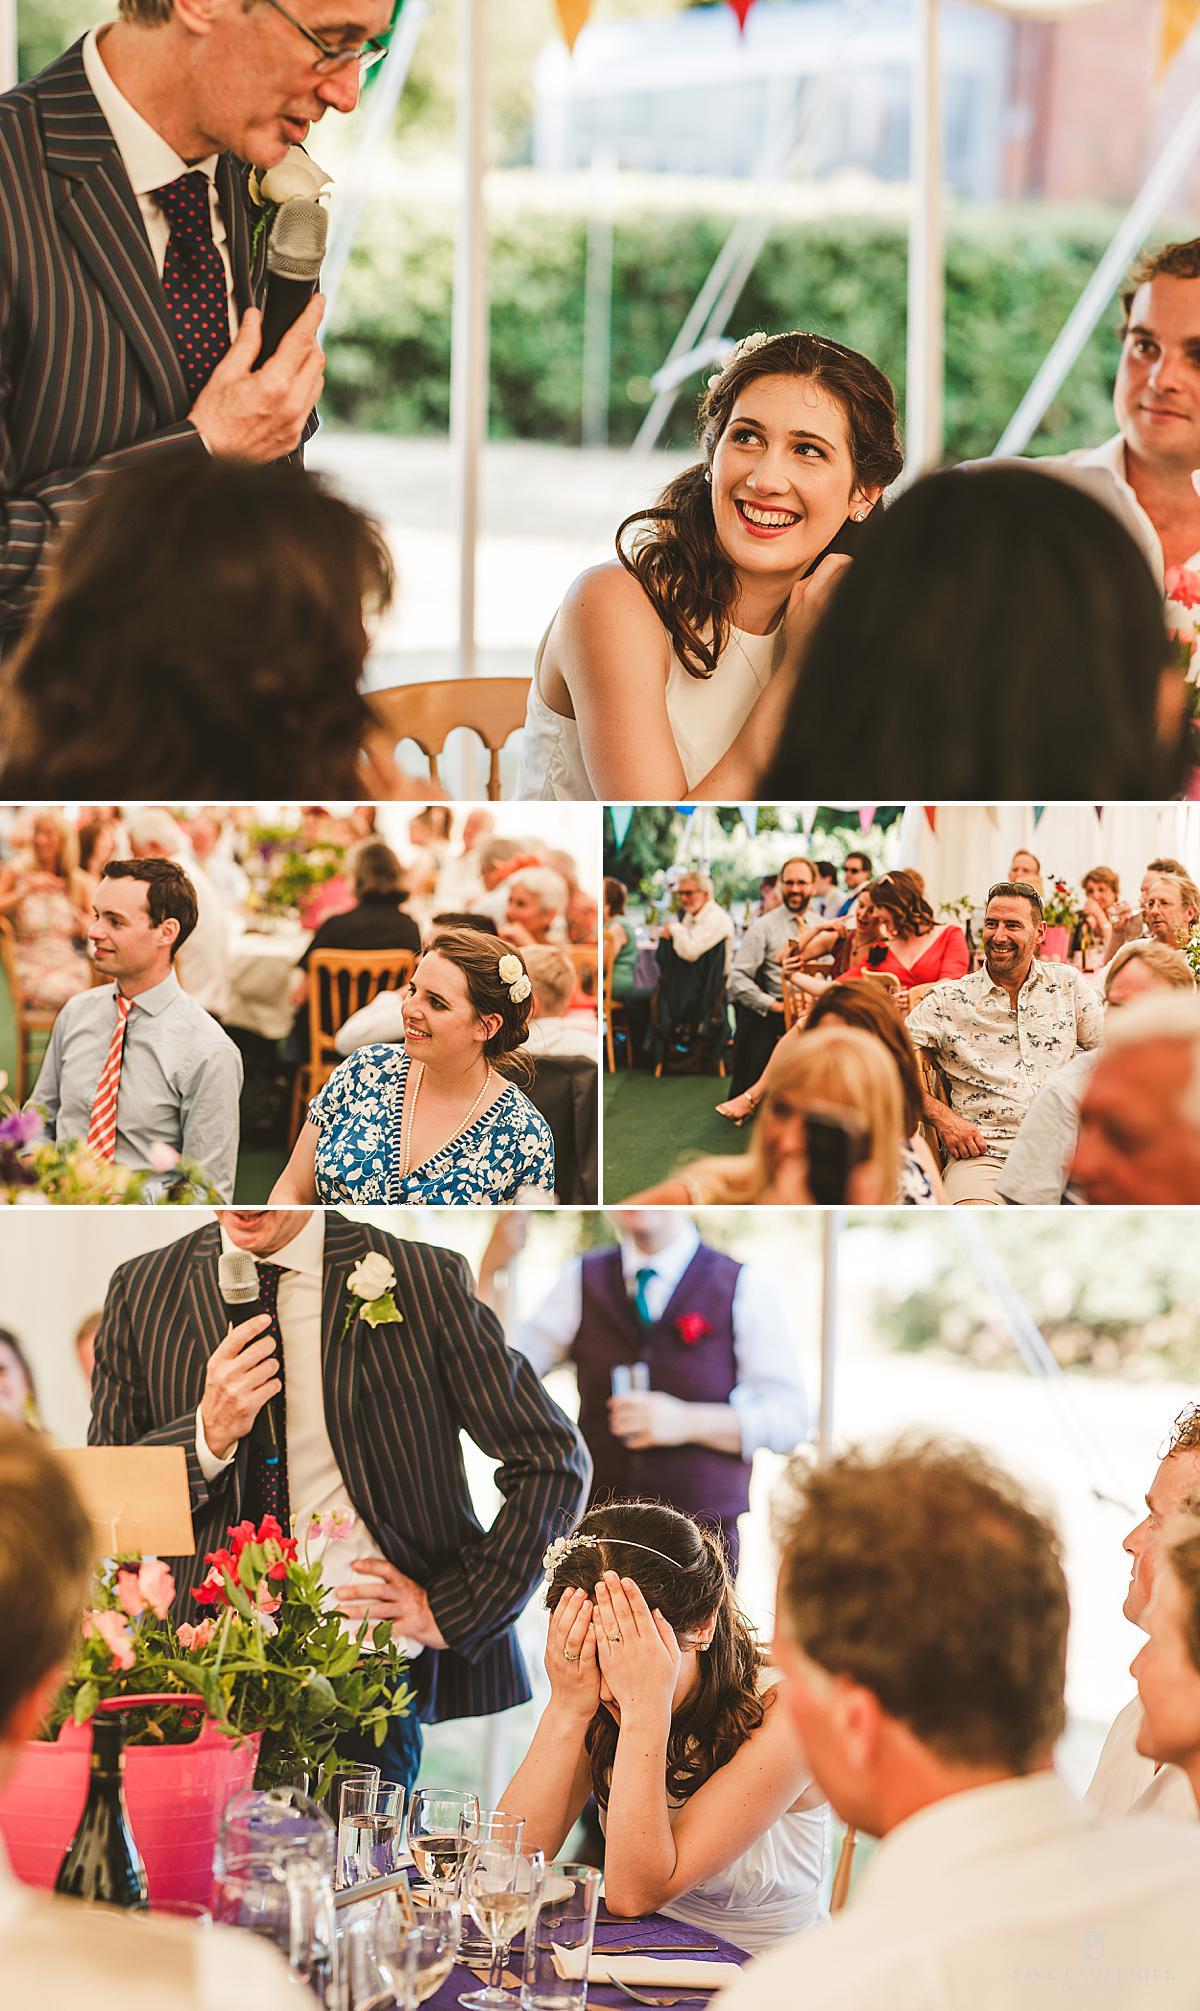 Dorset wedding photography outdoor wedding